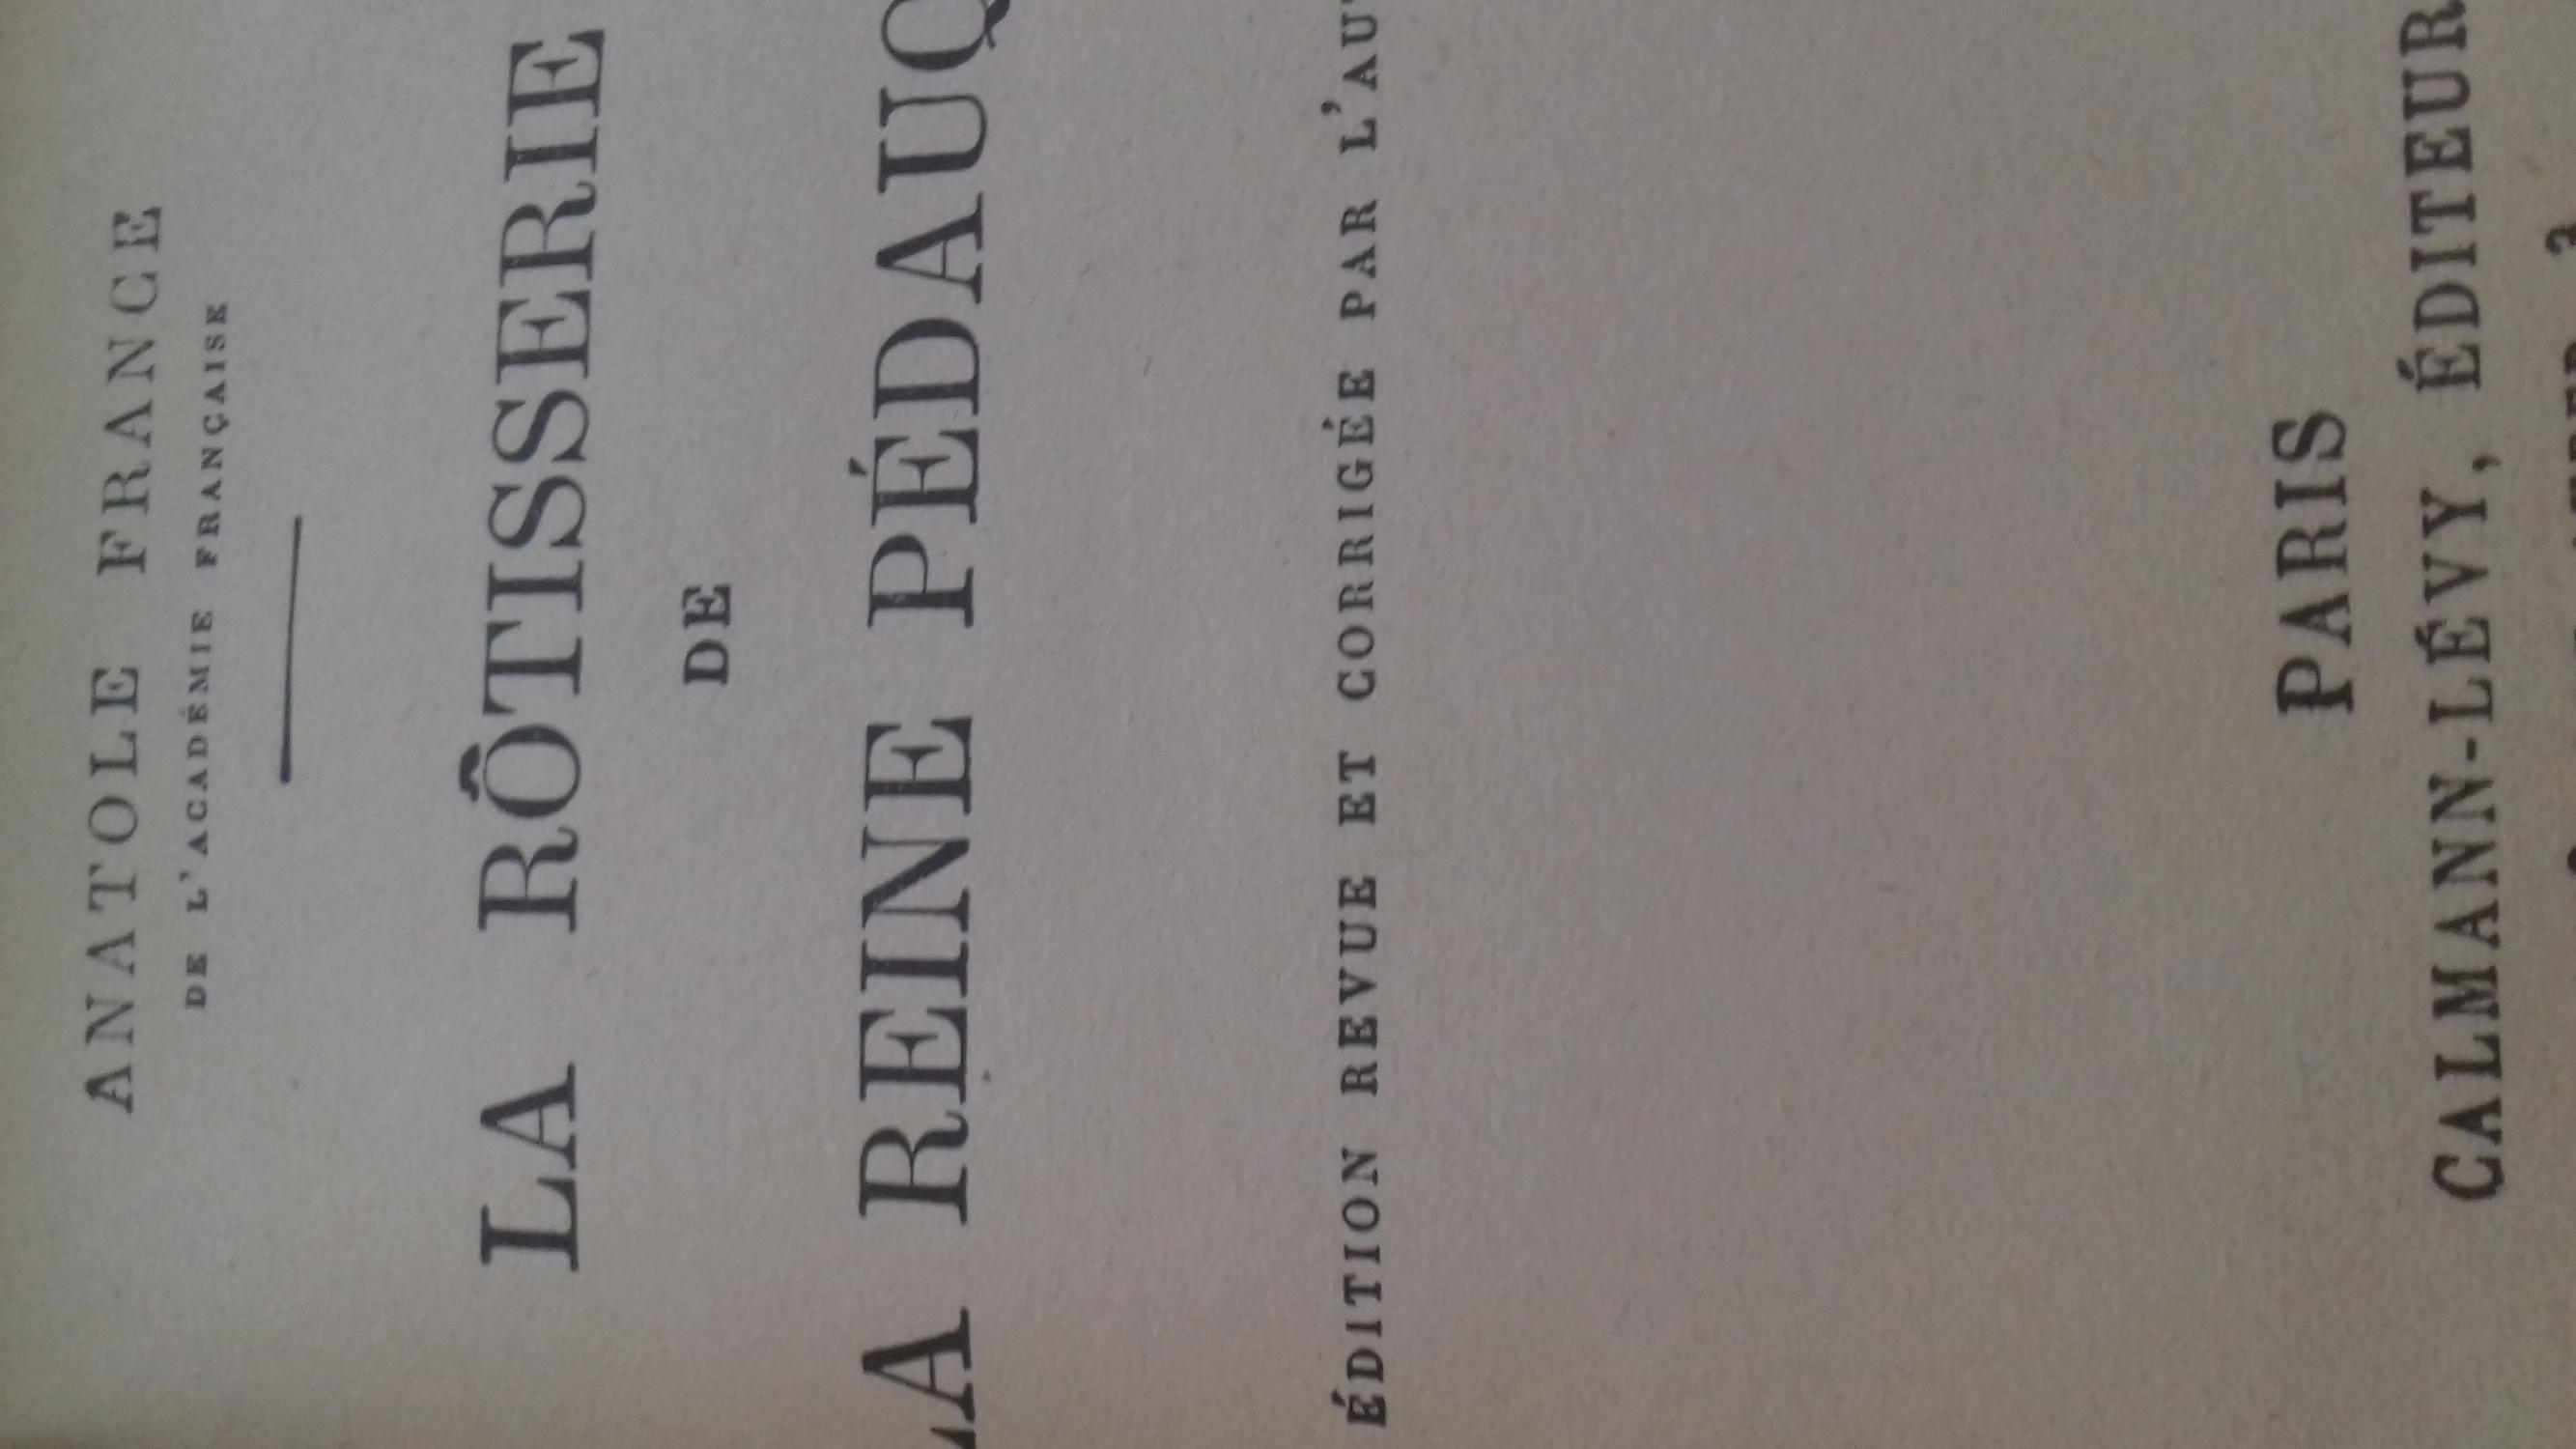 LA ROTISSERIE DE LA REINE PEDAUQUE. anatole france Near Fine Hardcover